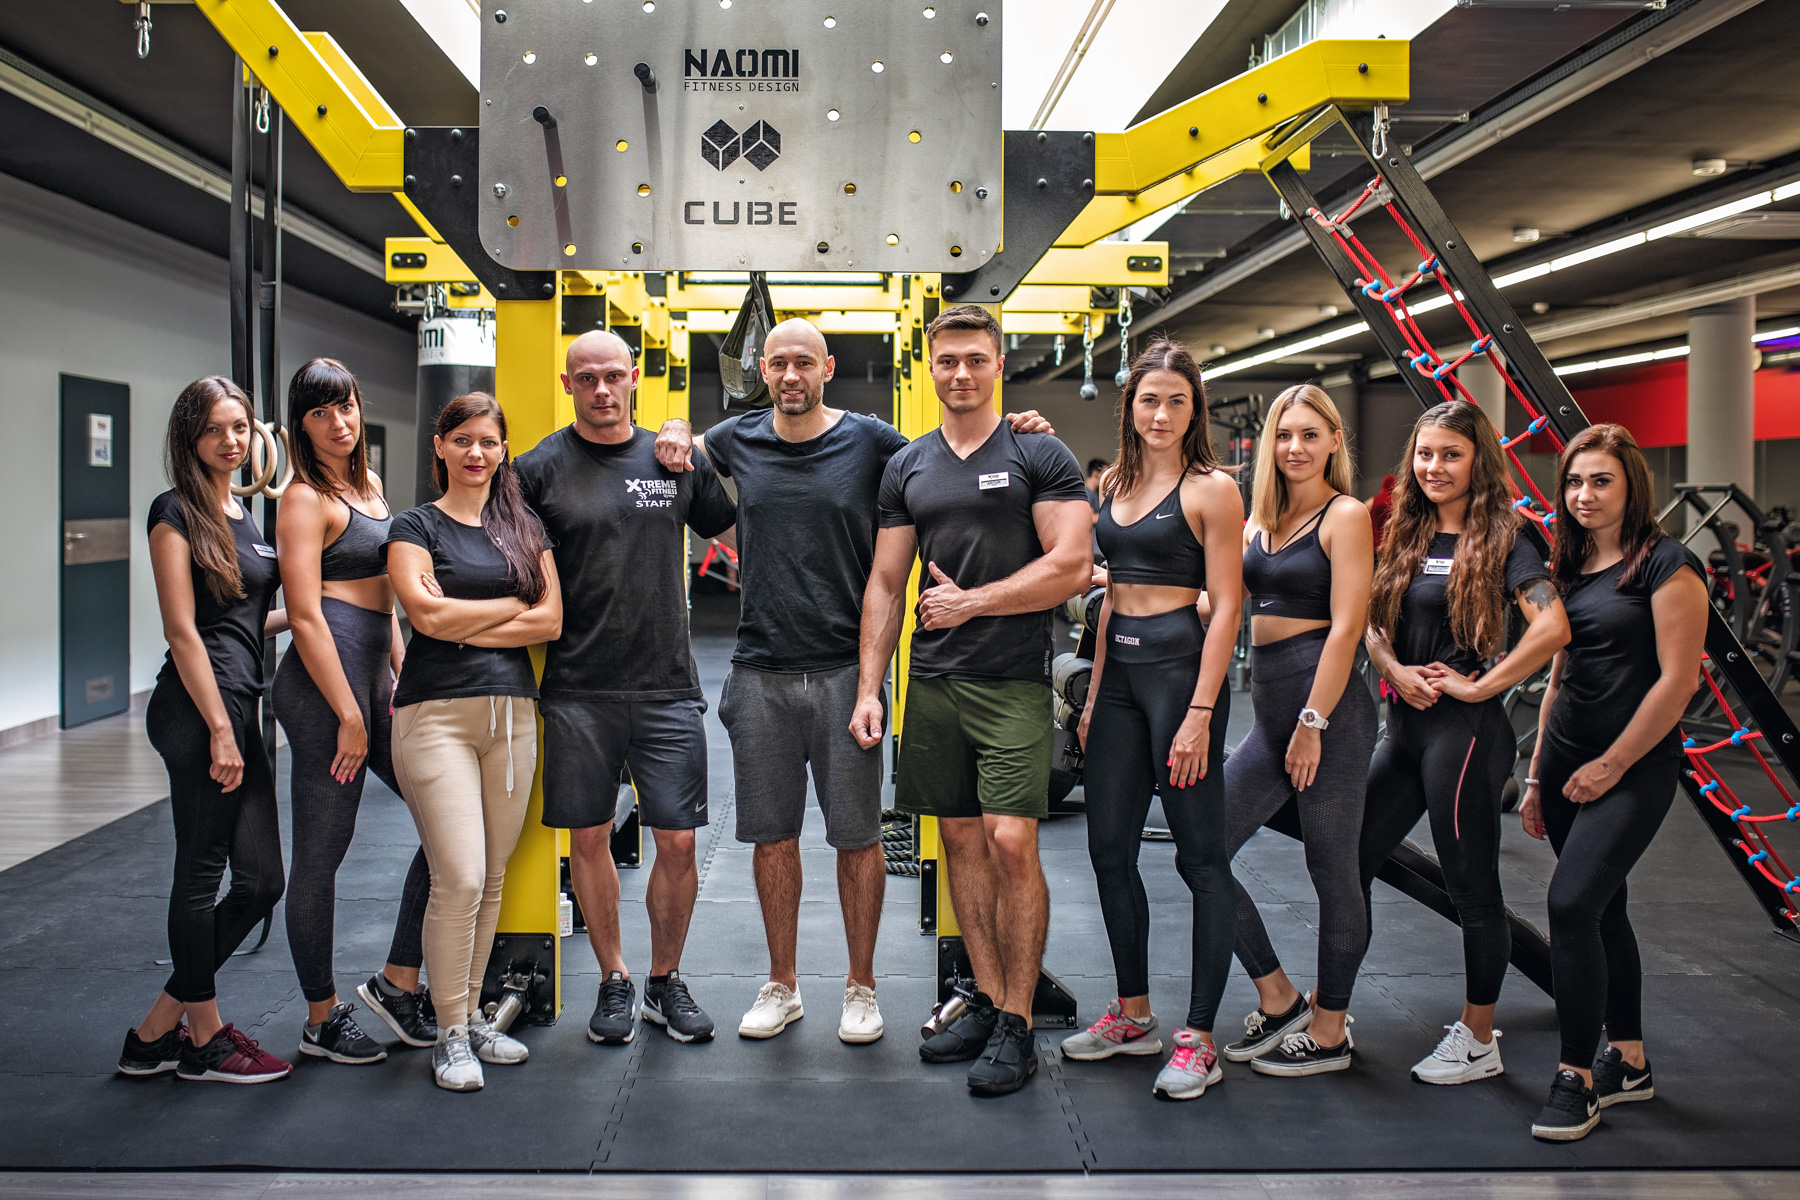 Xtreme Fitness Rybnik